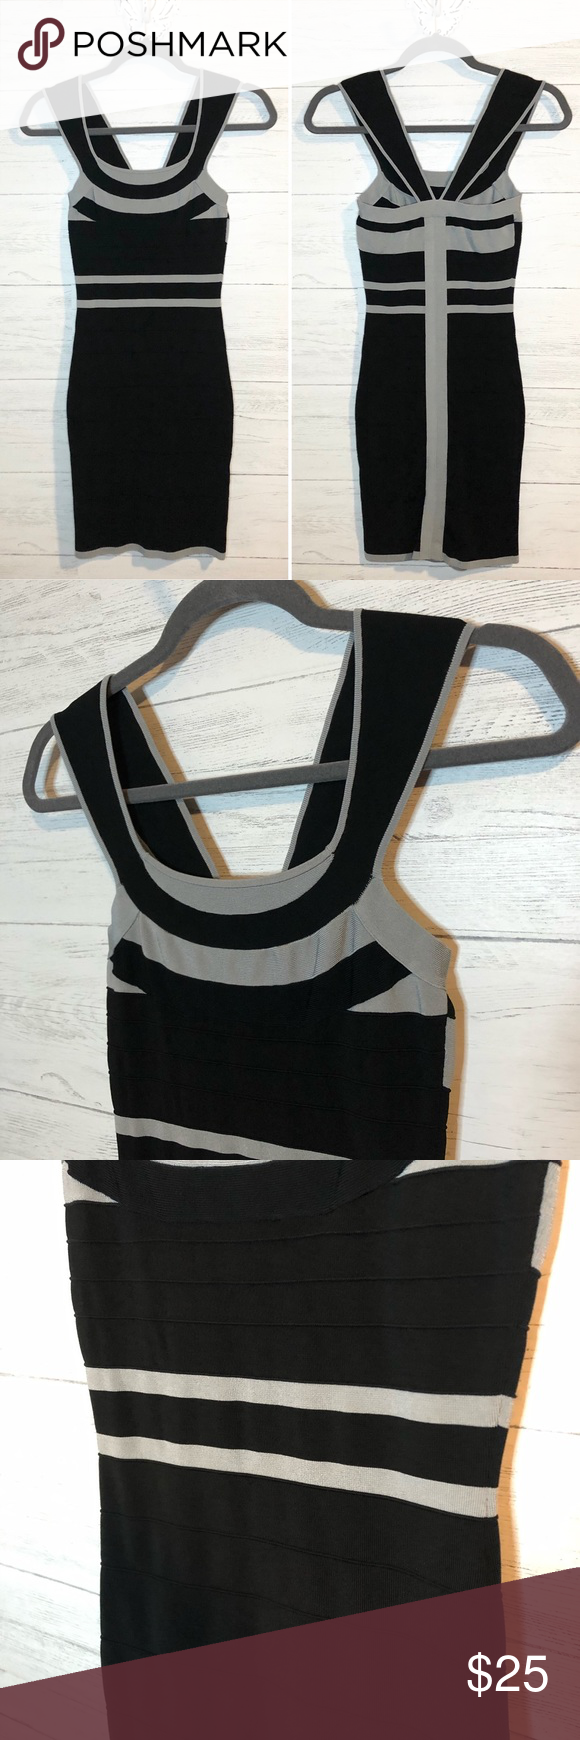 Bild von Express black & gray bodycon bandage dress Express black & gray s